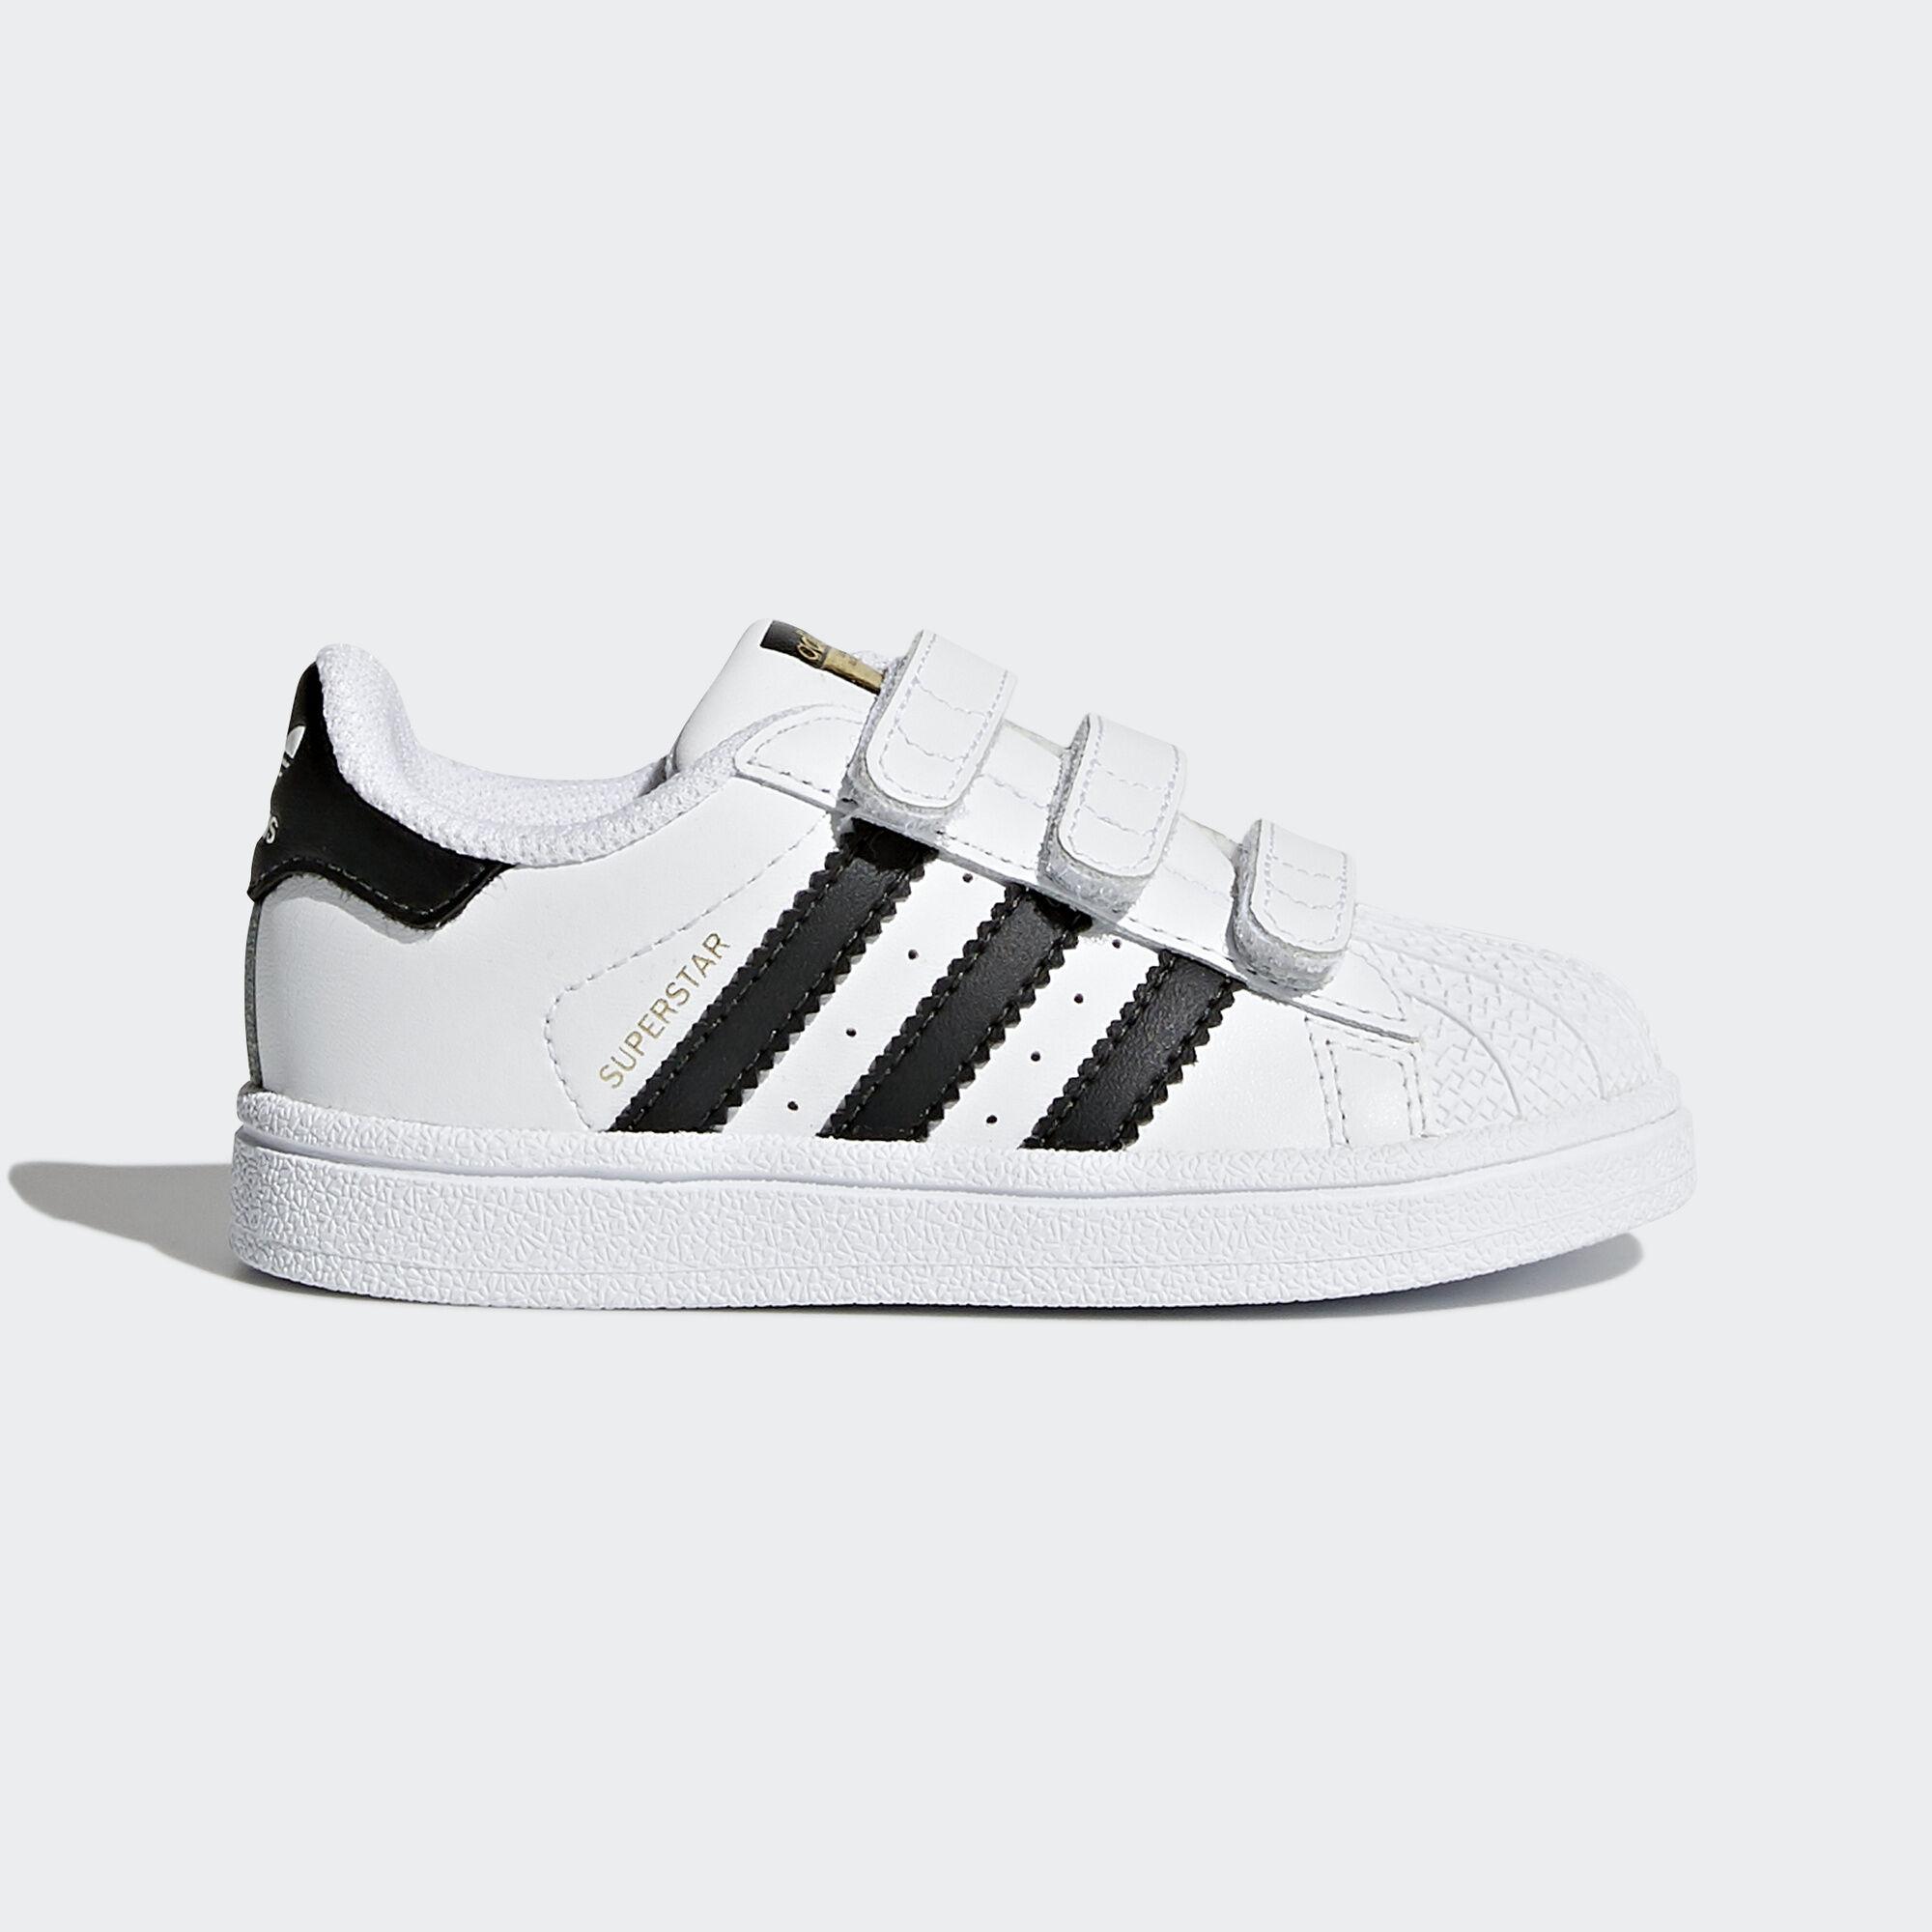 Adidas Star Shoes Foot Locker Women